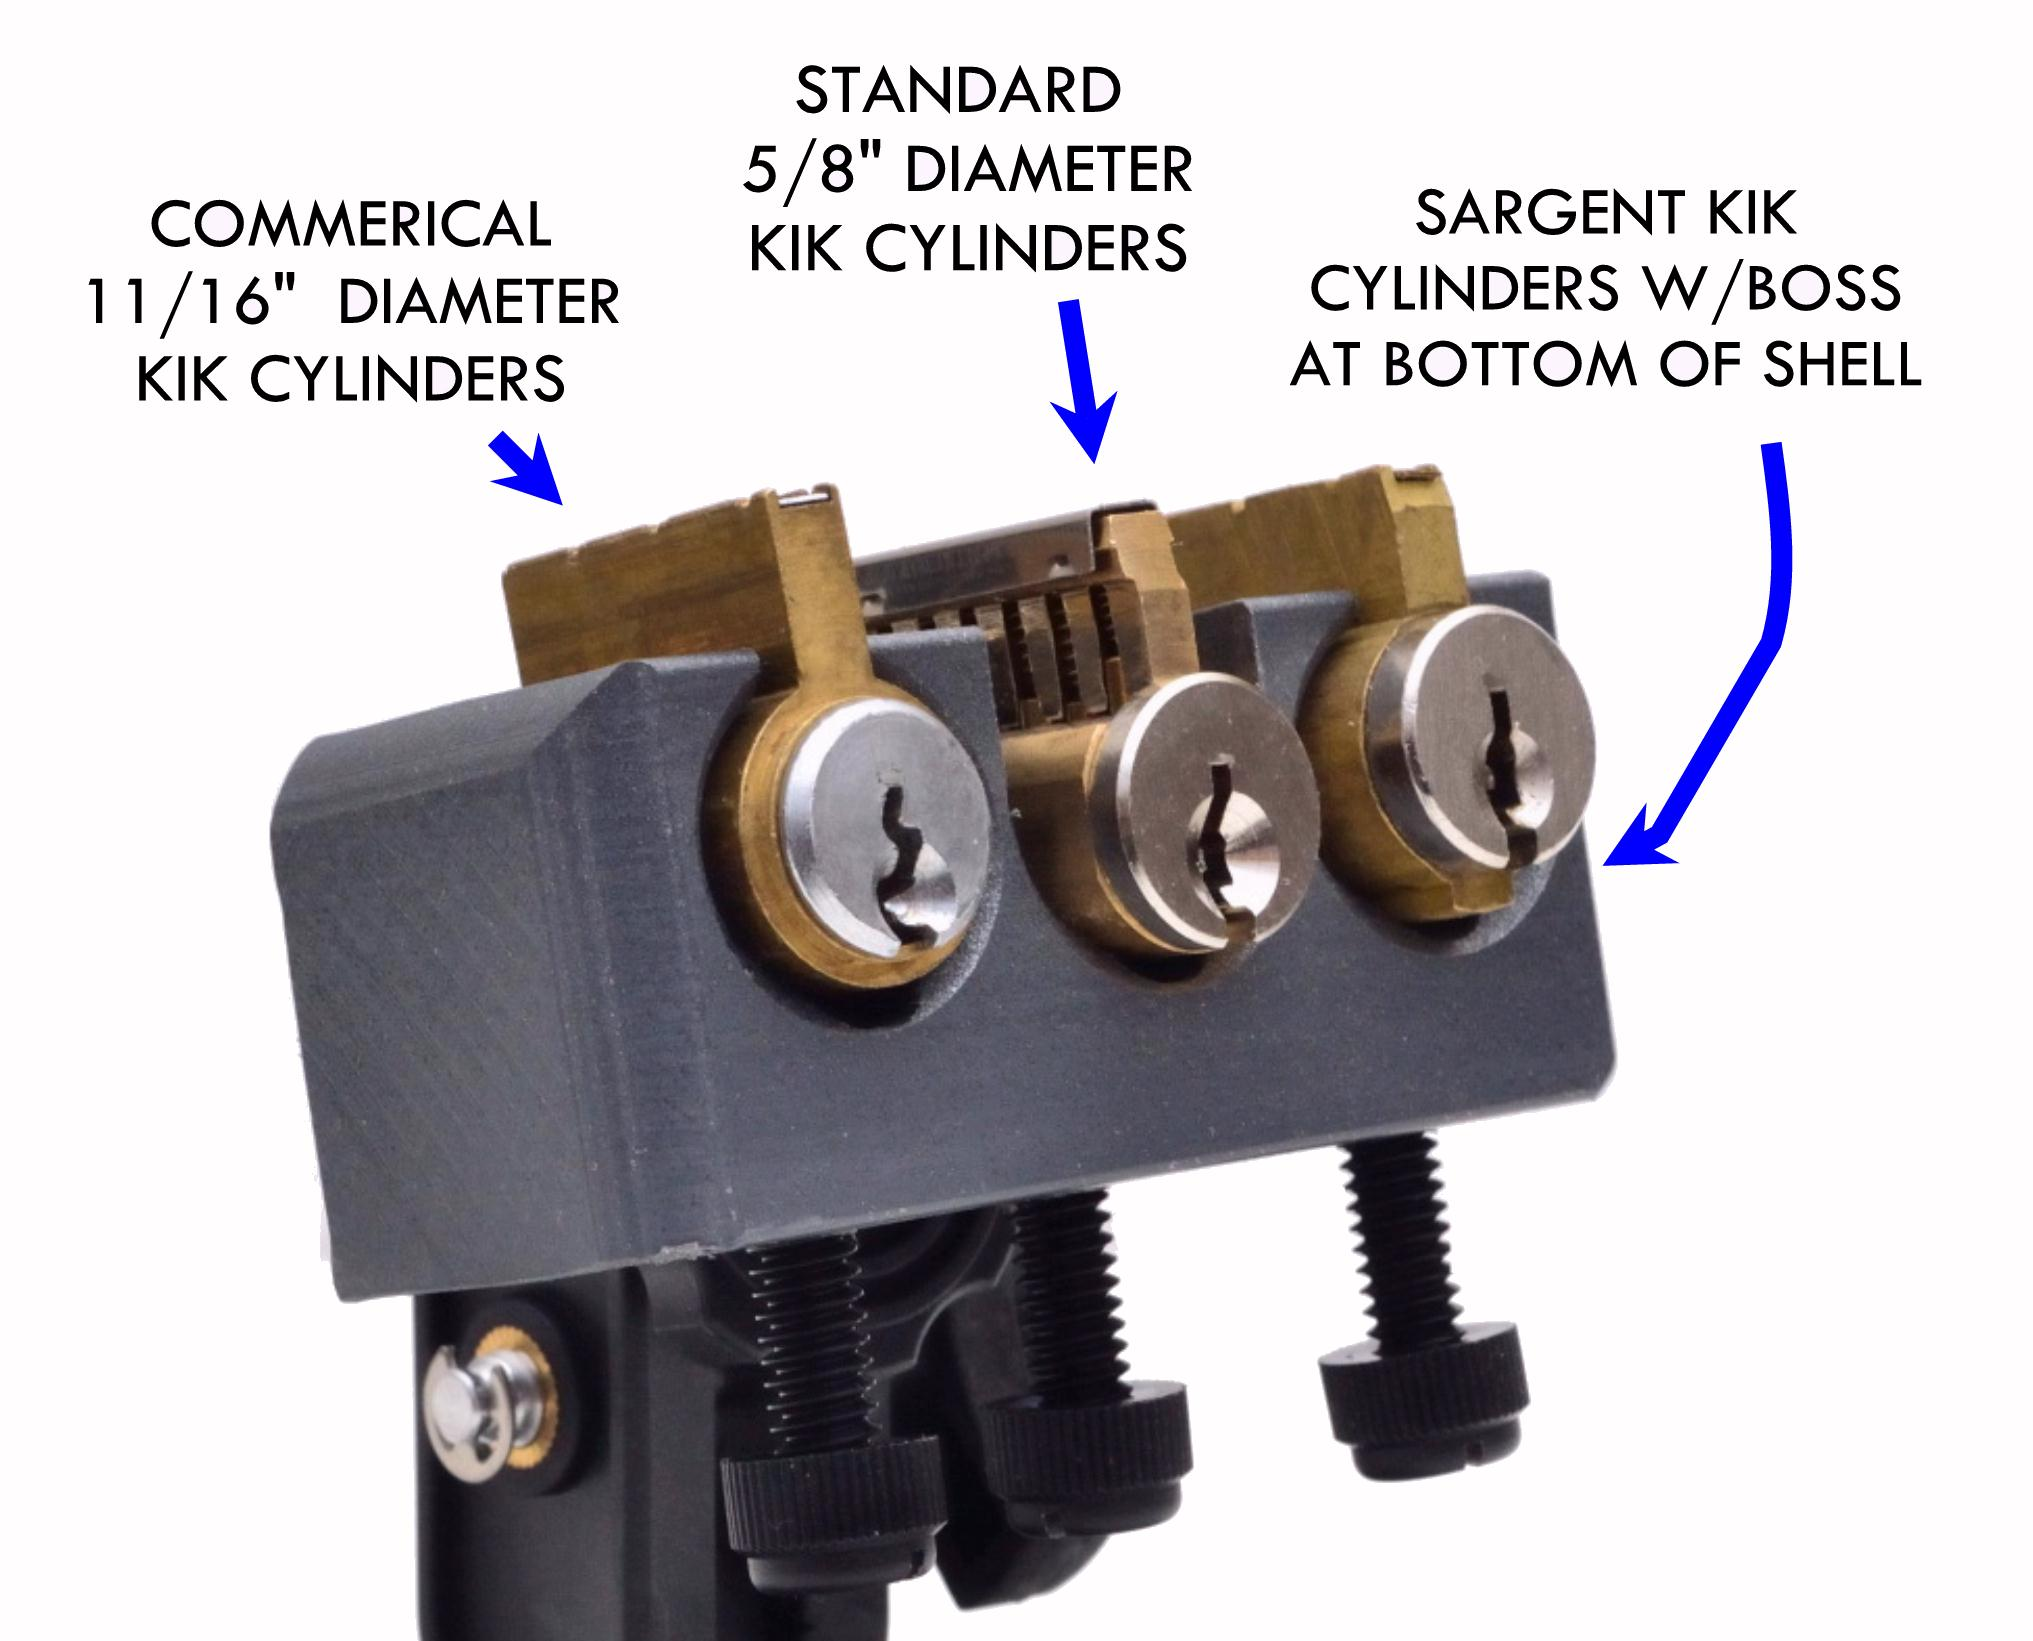 TriPik-II Mod XPC Practice Stand for KIK Lock Cylinders